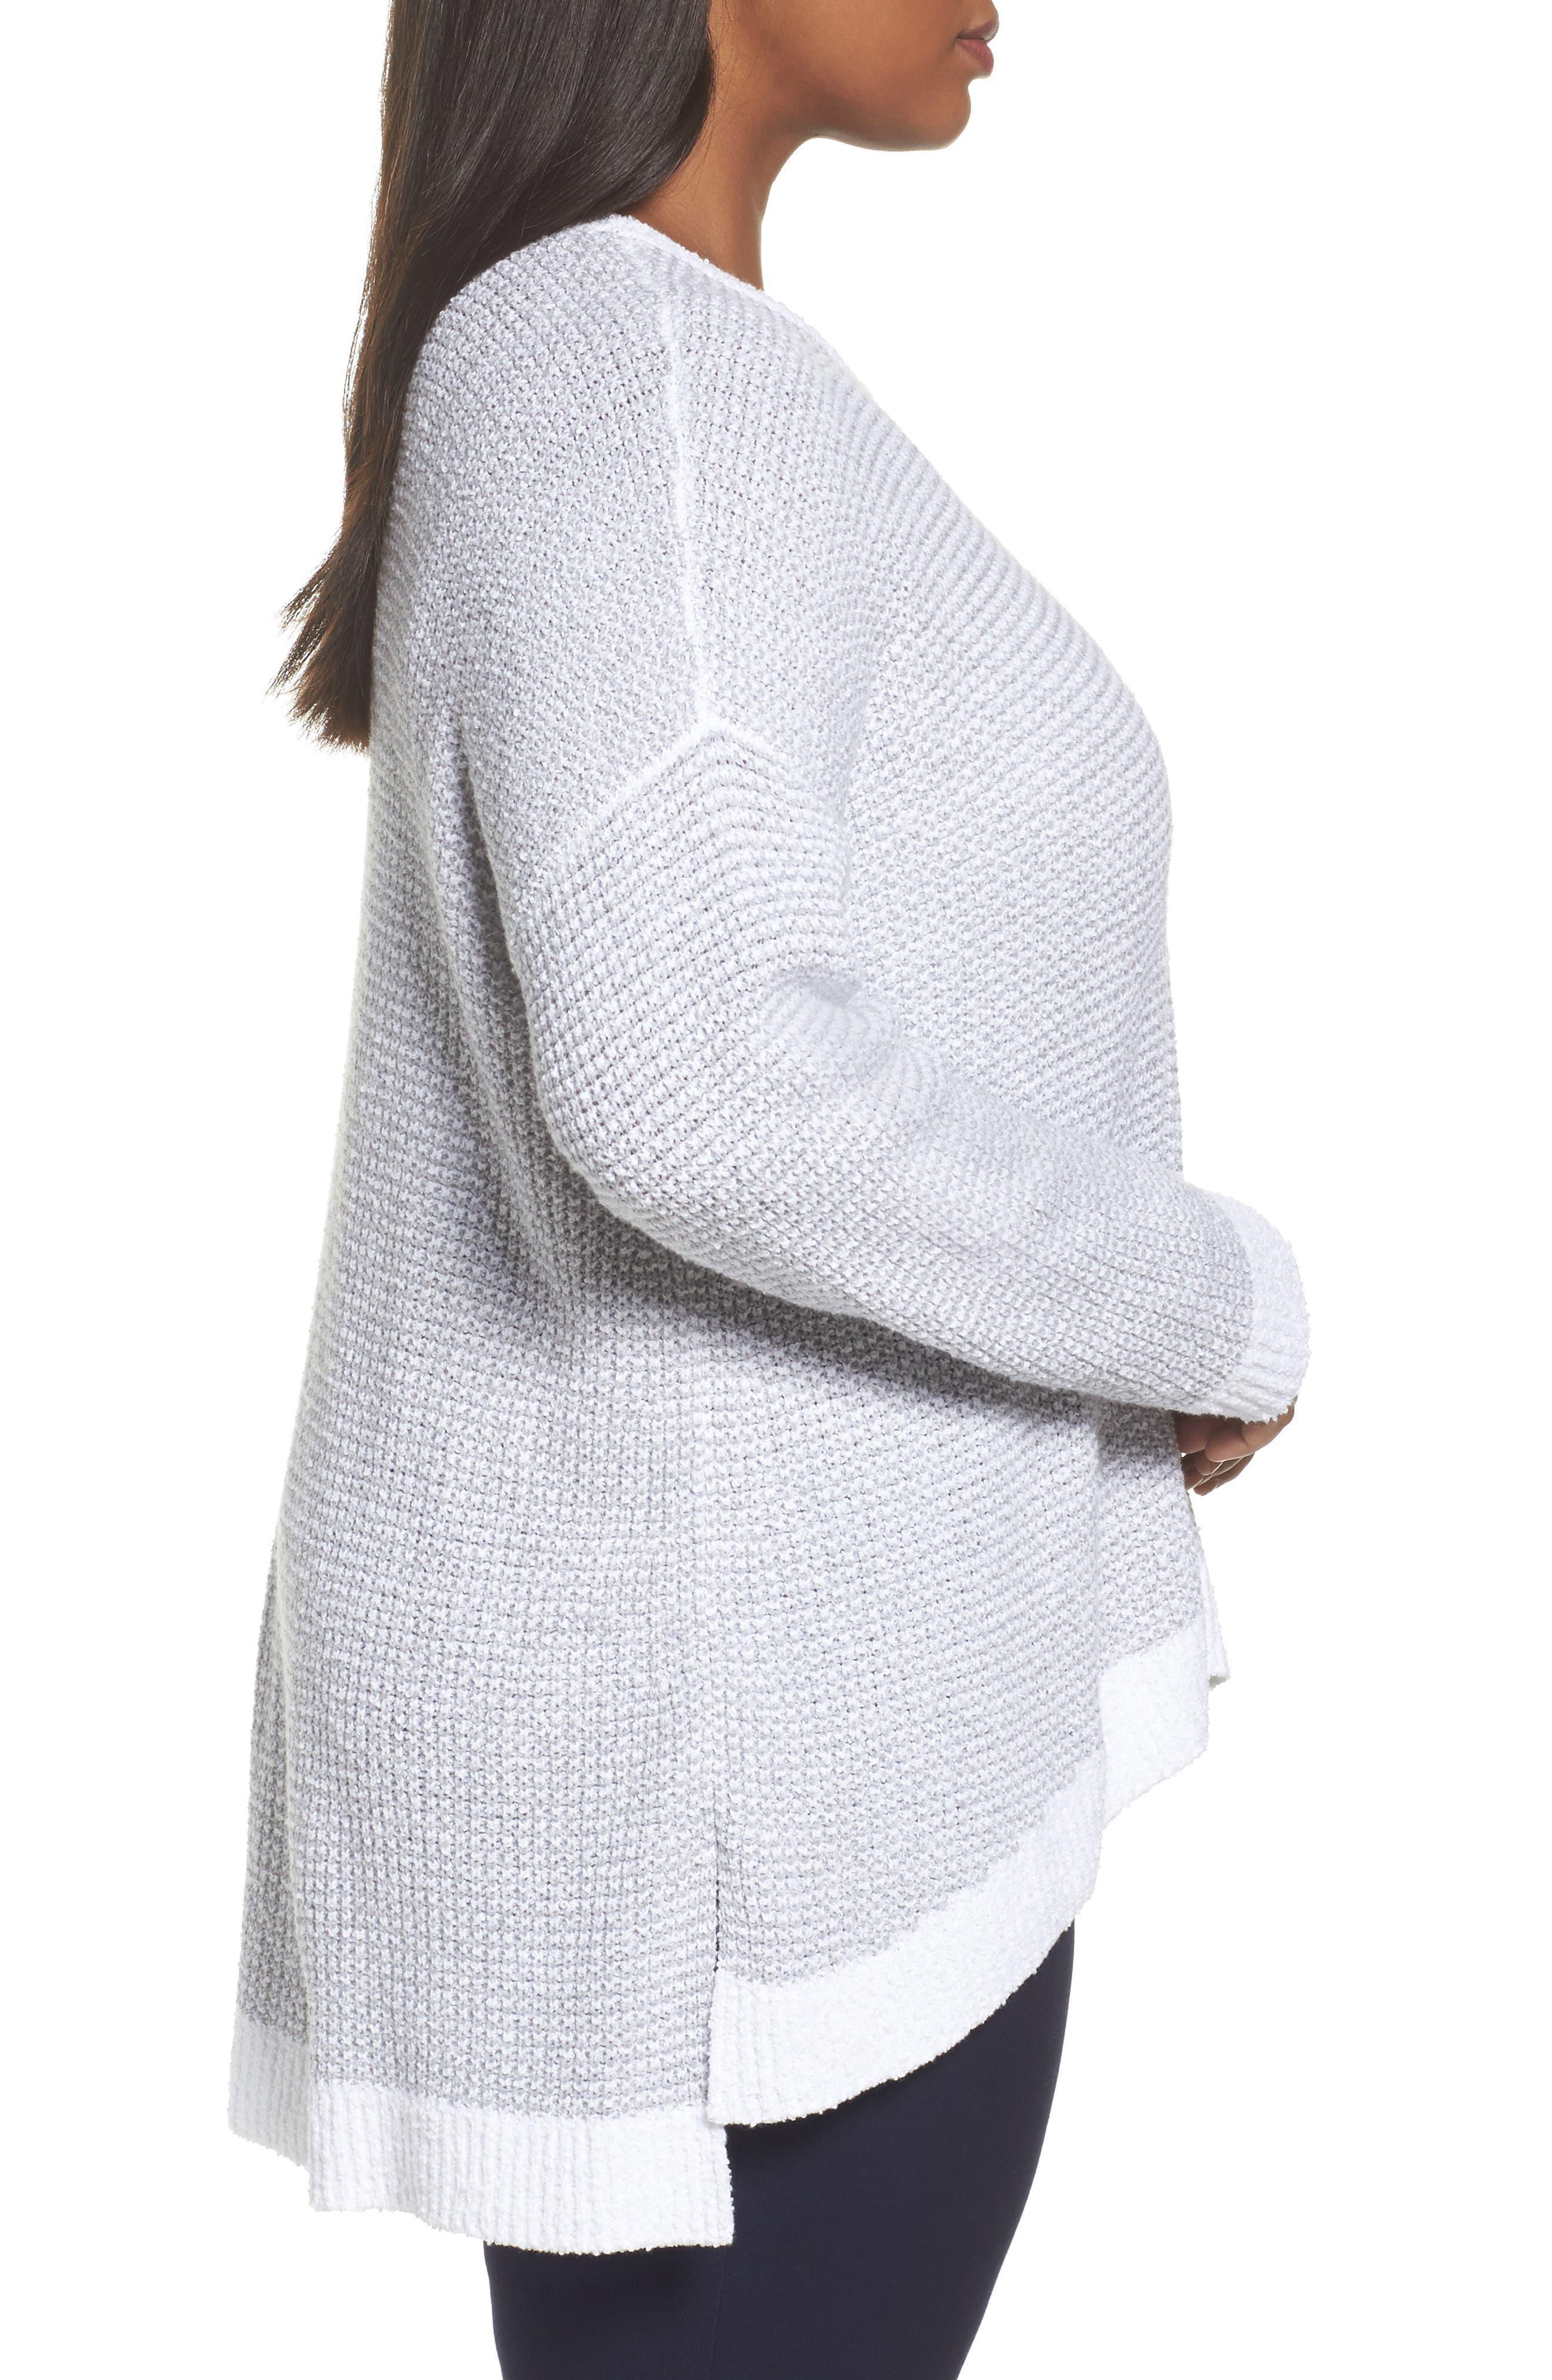 Waffled Organic Cotton Sweater,                             Alternate thumbnail 3, color,                             Grey